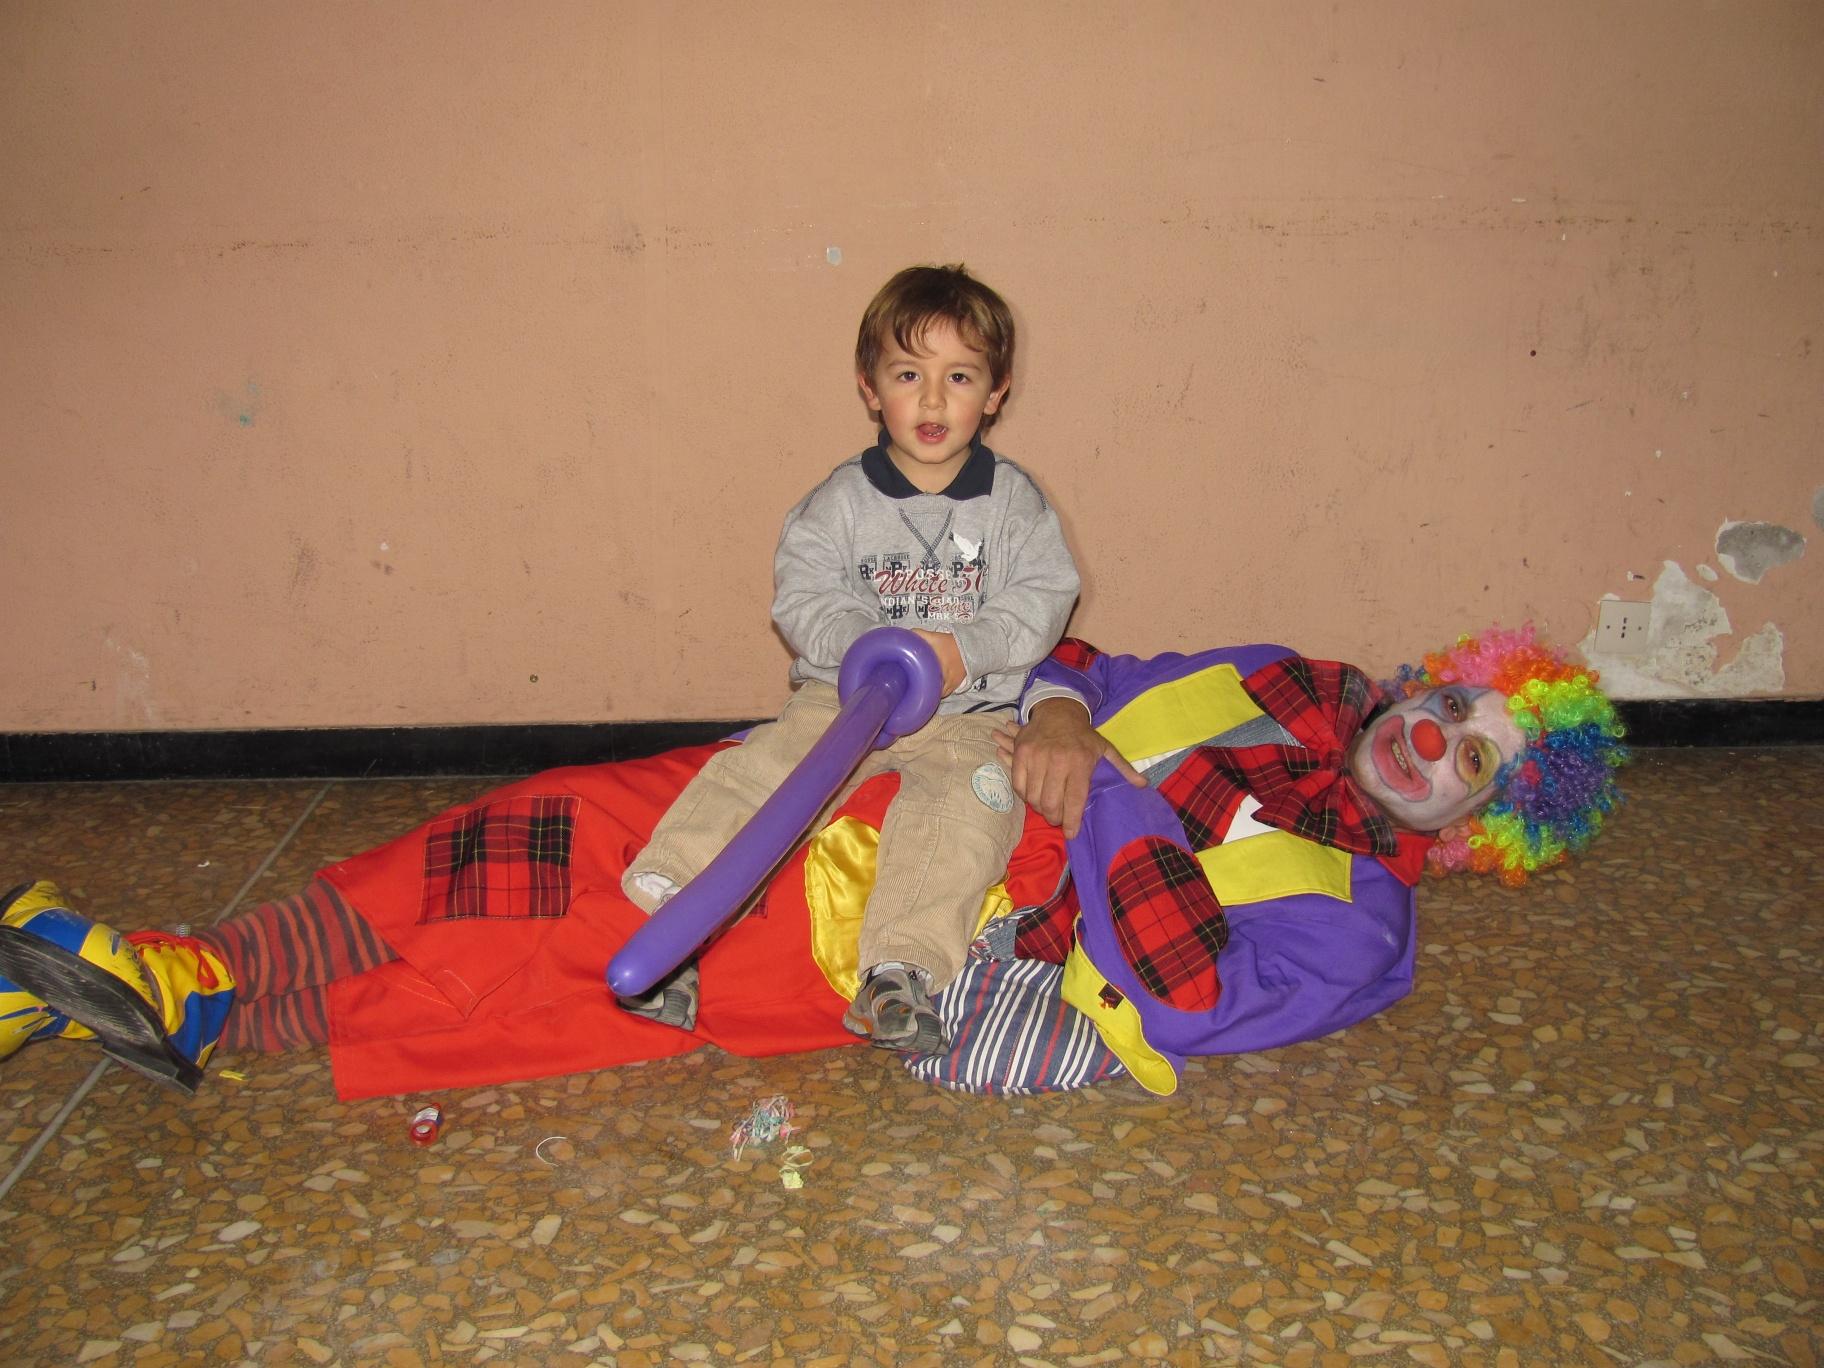 ricordo_battesimo_gesu_2011-01-23-17-17-57